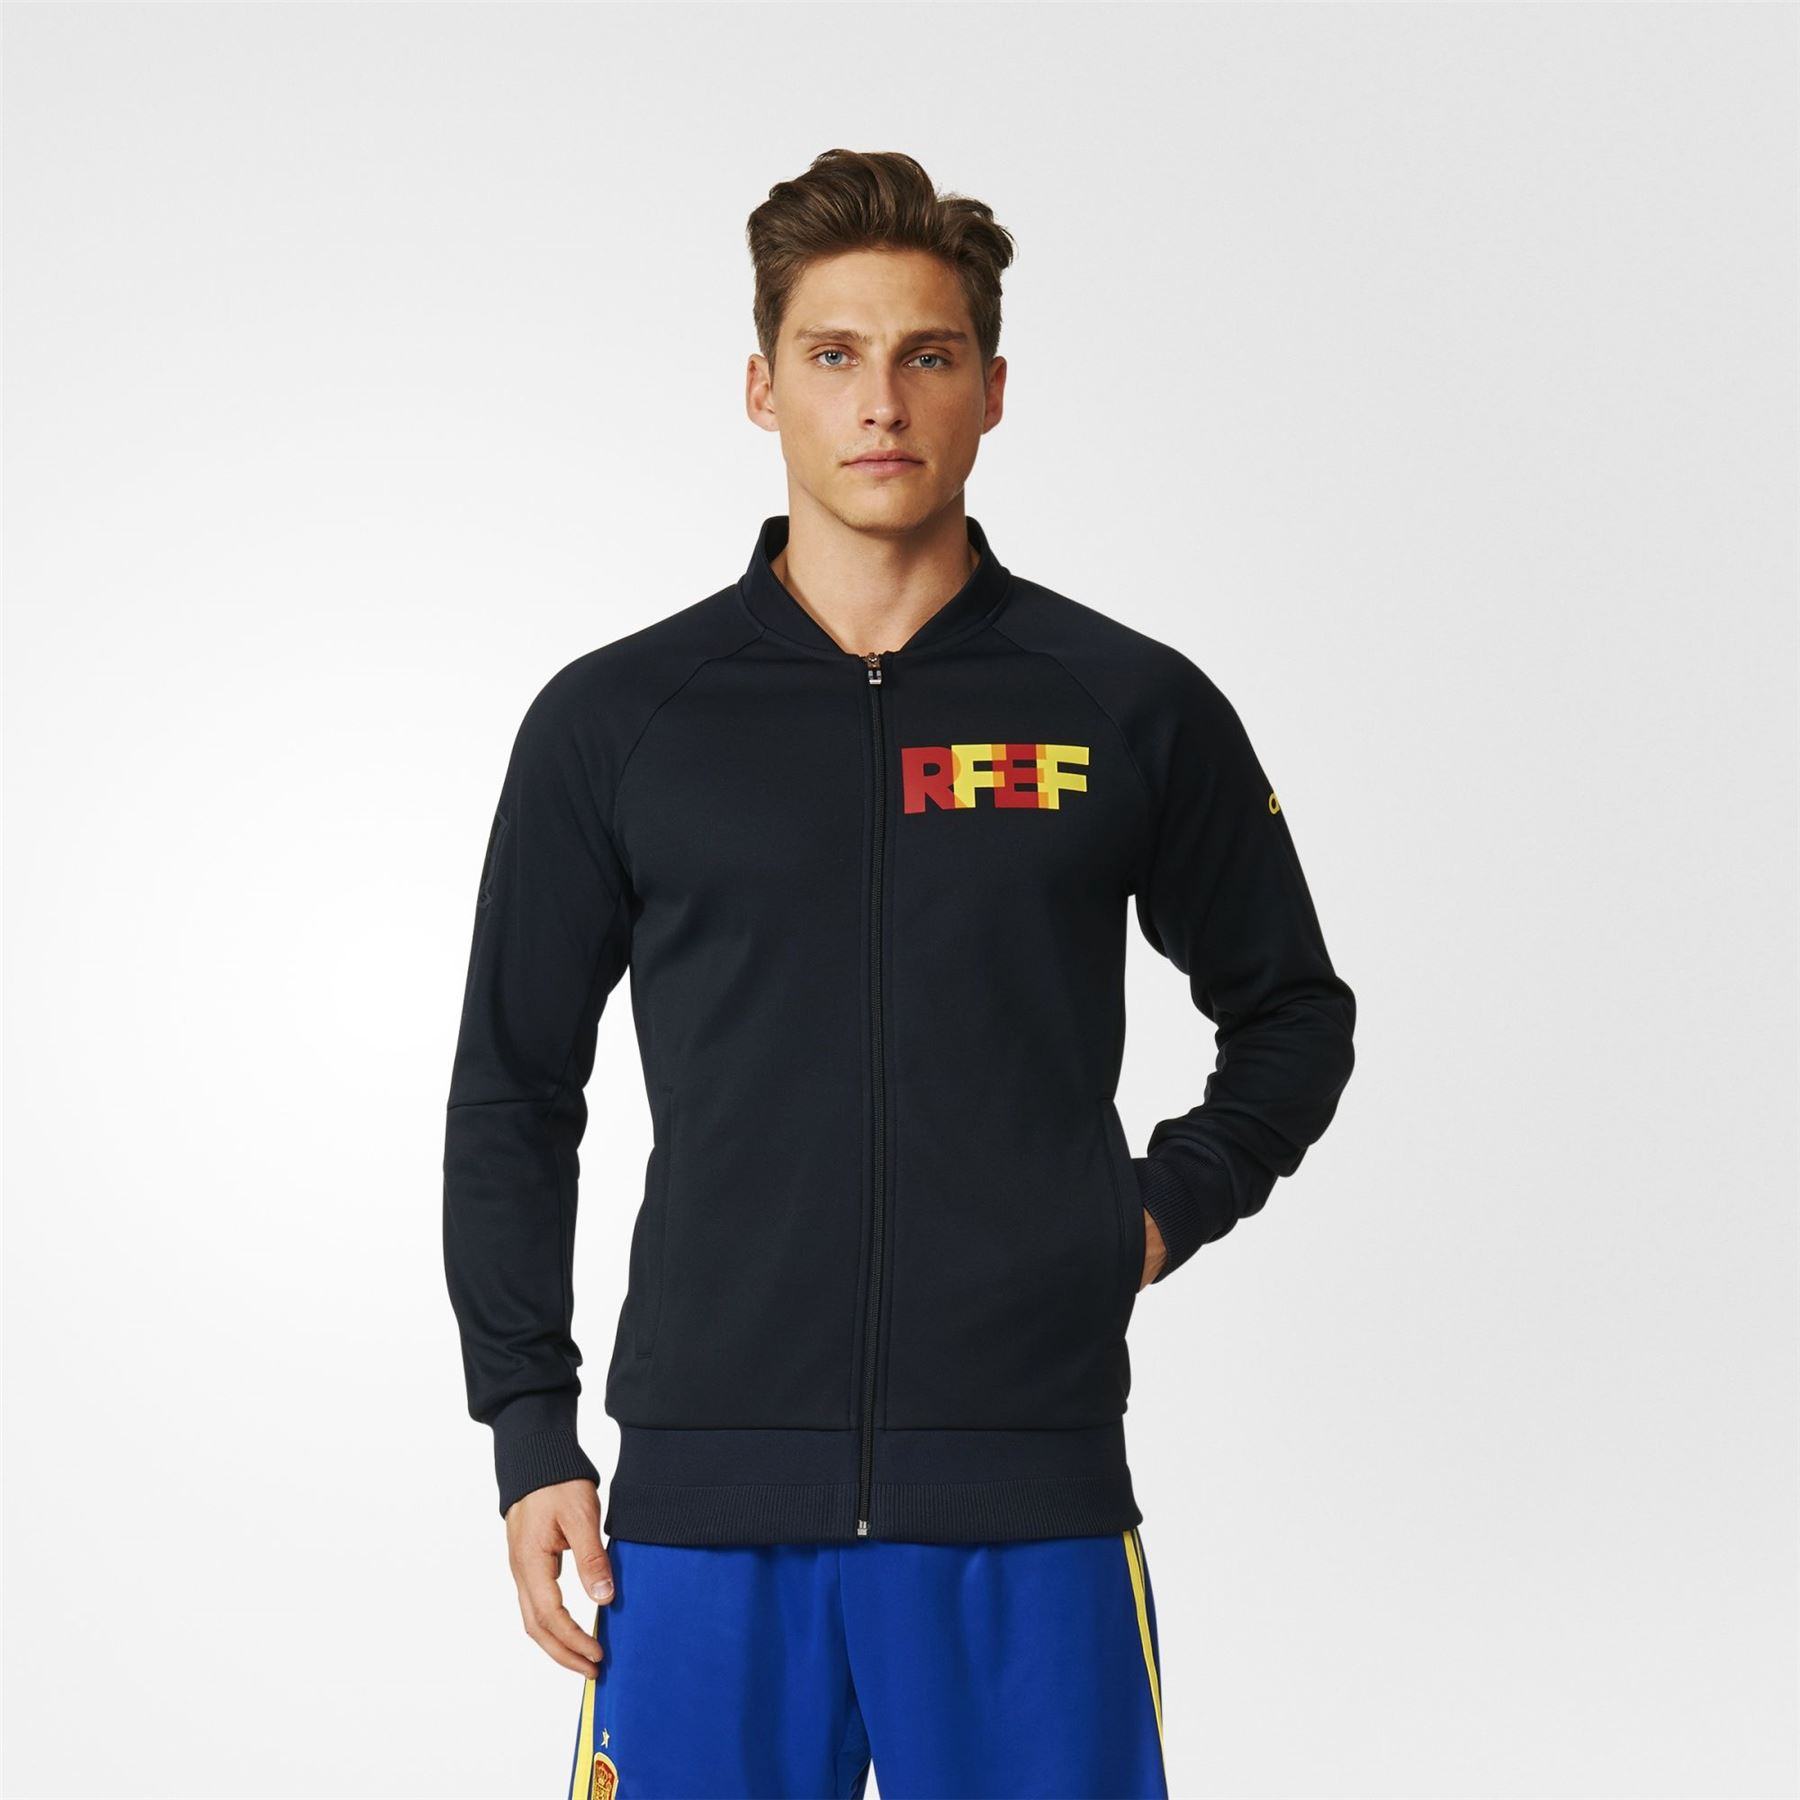 Details zu adidas SPAIN WOVEN ANTHEM JACKET WHITE RED FOOTBALL SOCCER MEN'S XS XXL